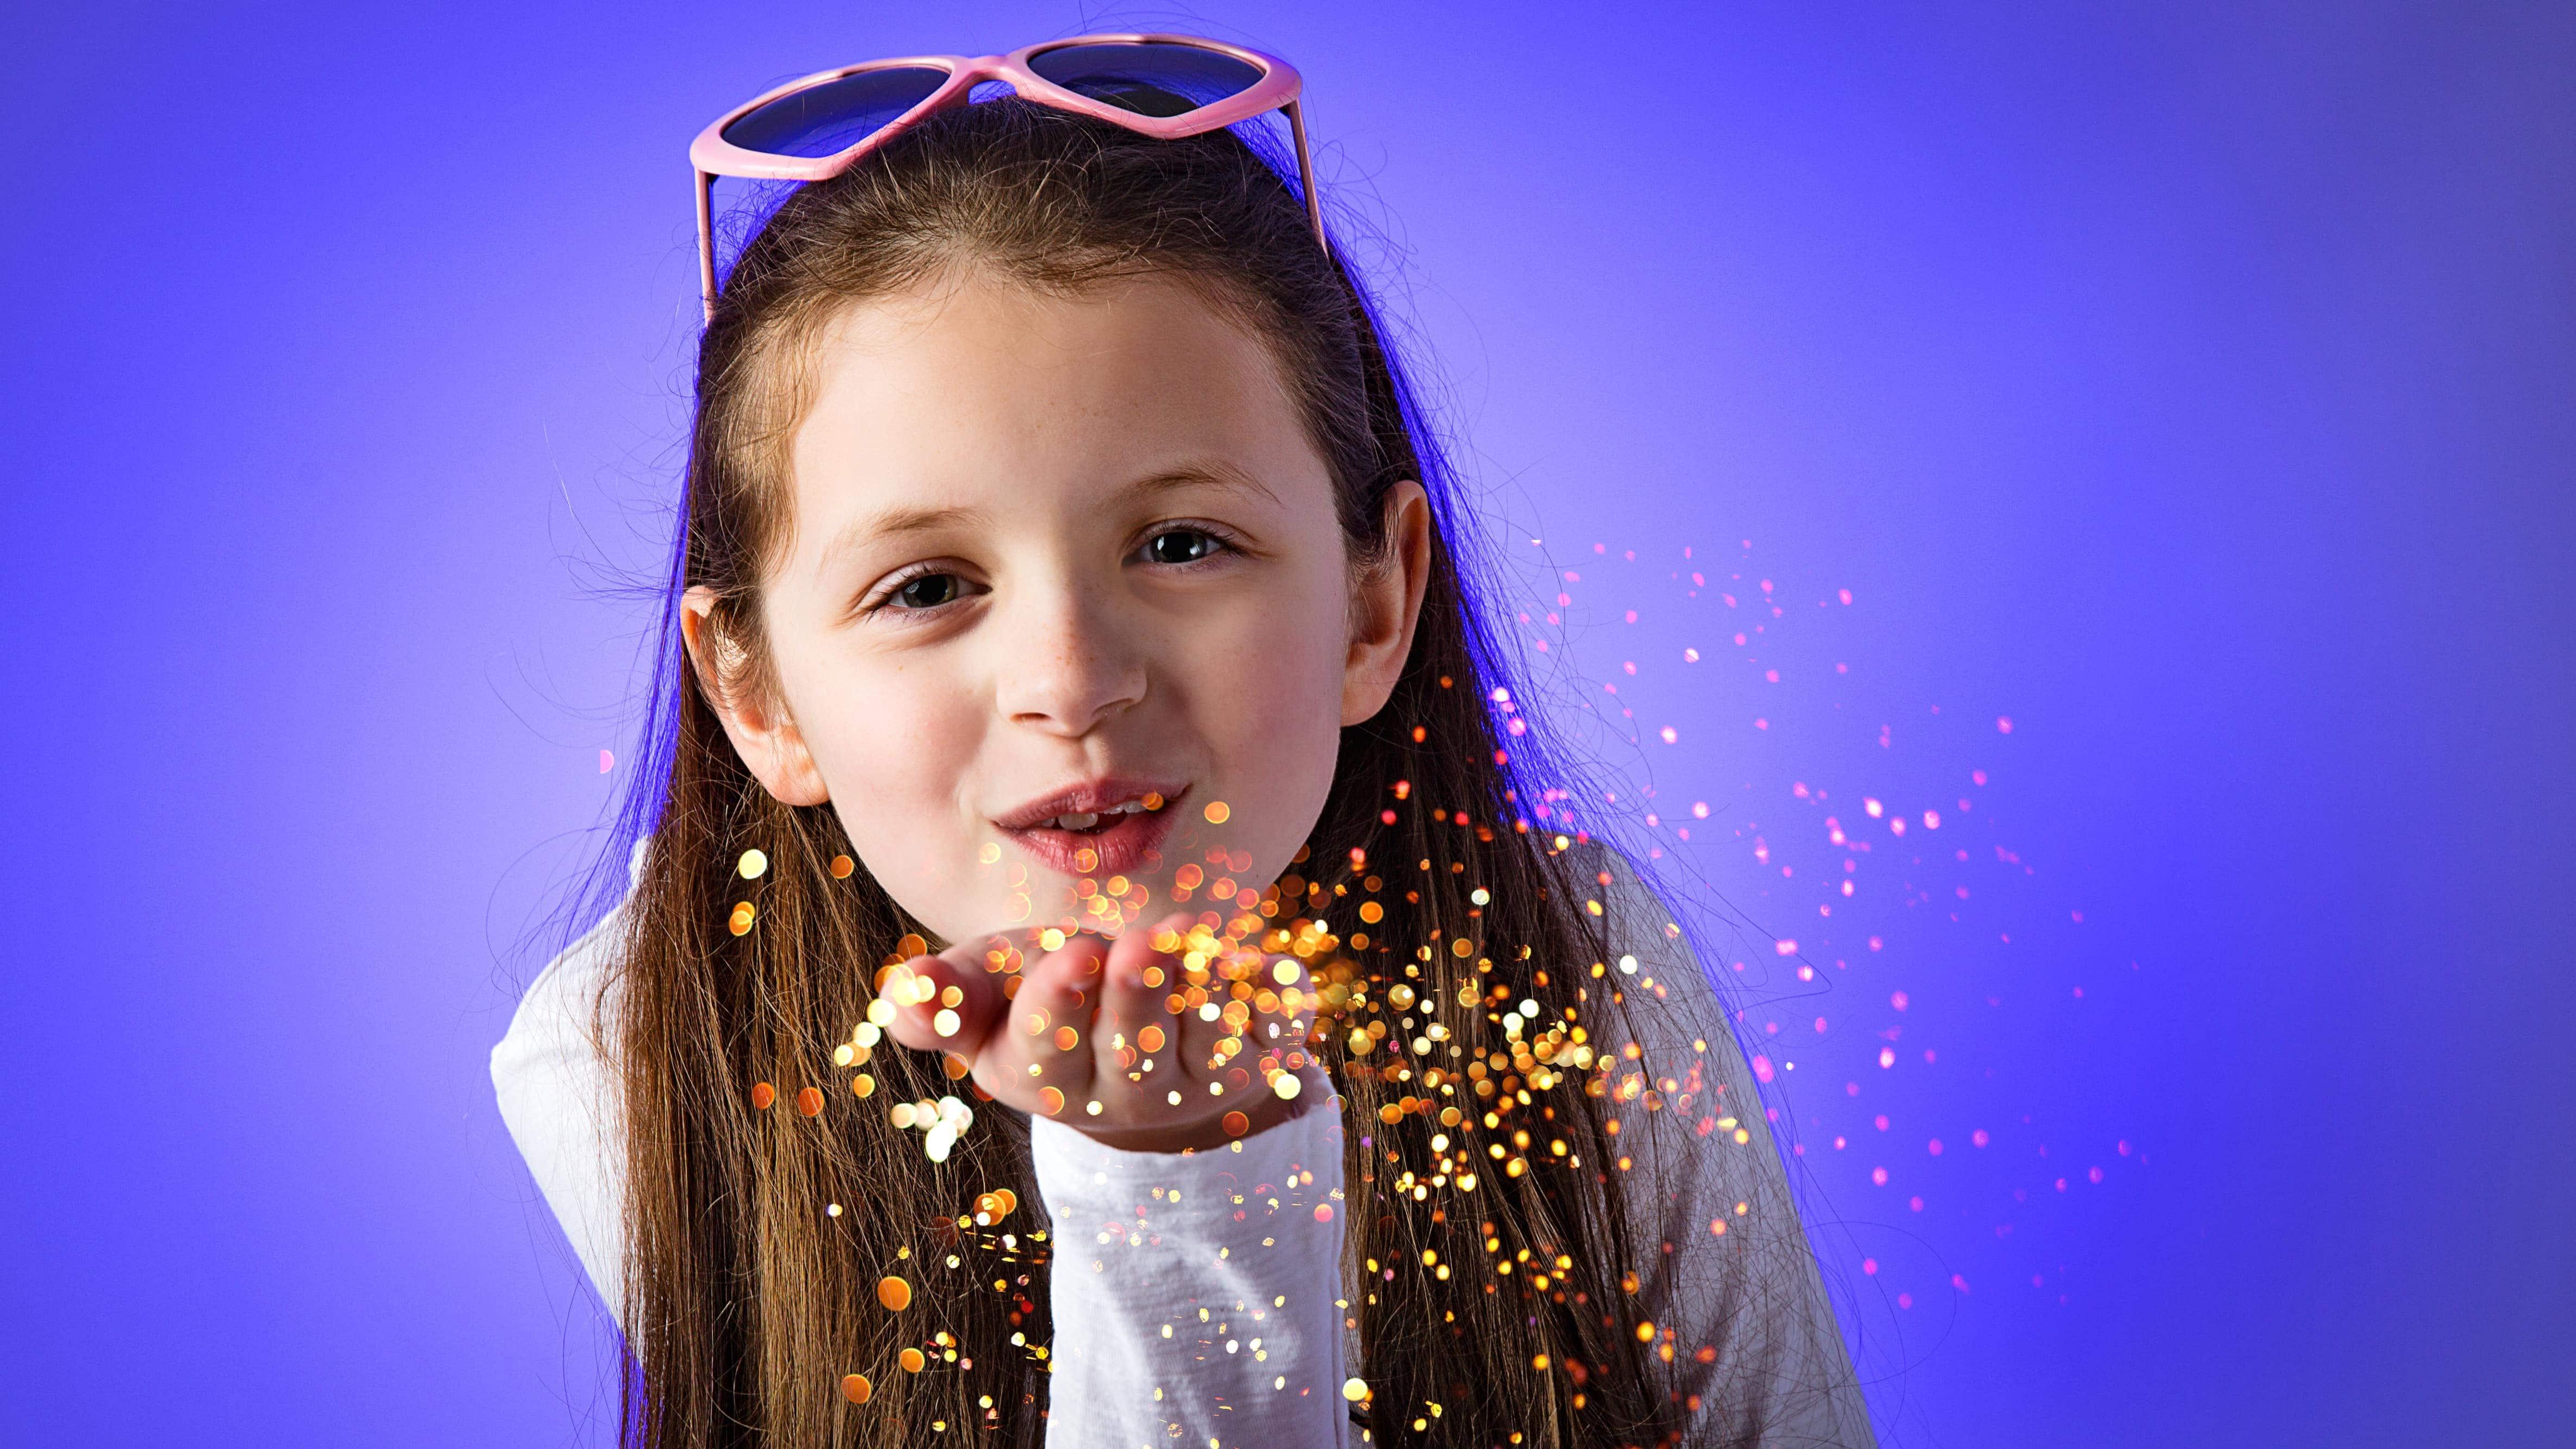 girl blowing glitter photo shoot Sarah Offley Ellesmere Port